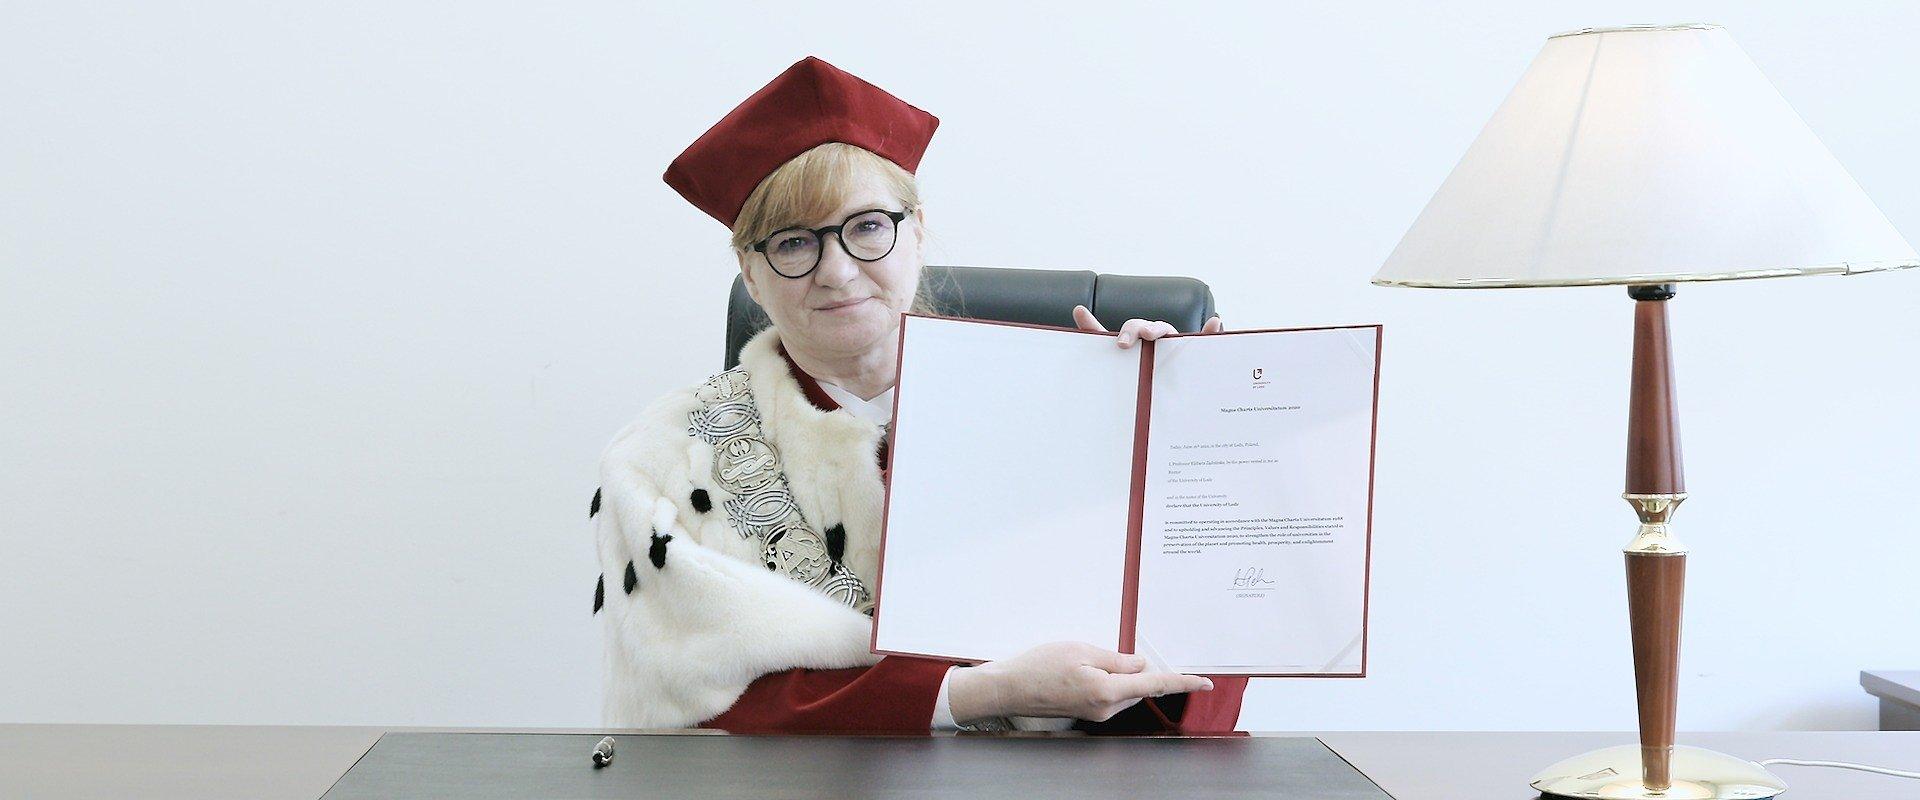 Uniwersytet Łódzki potwierdził Magna Charta Universitatum